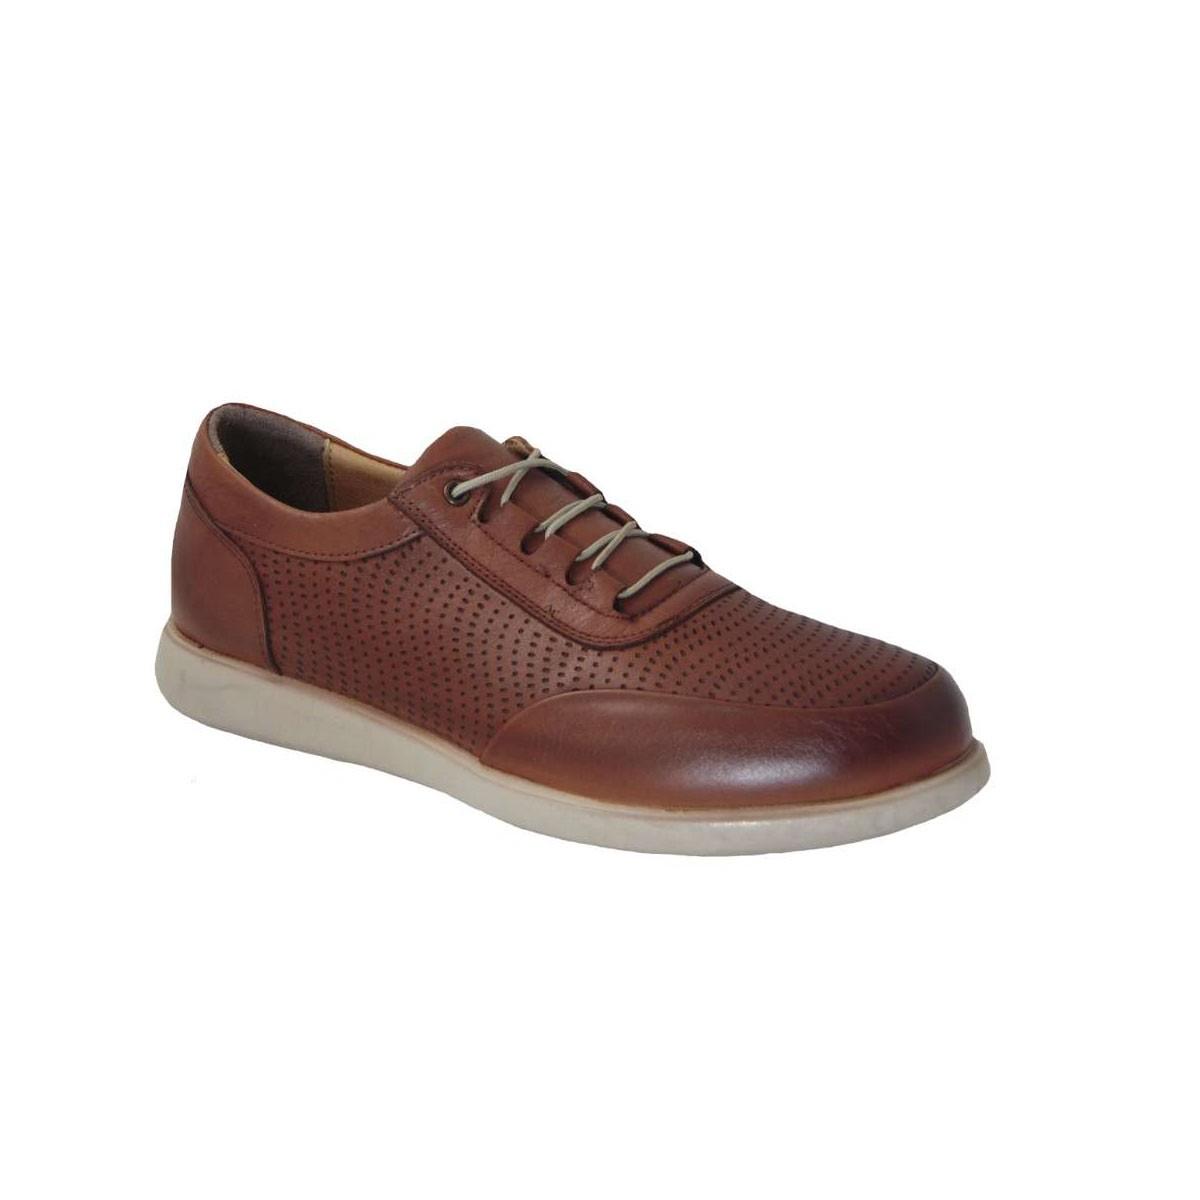 Tsimpolis Shoes 905 Ανατομικό Δερμάτινο Δετό Ταμπά